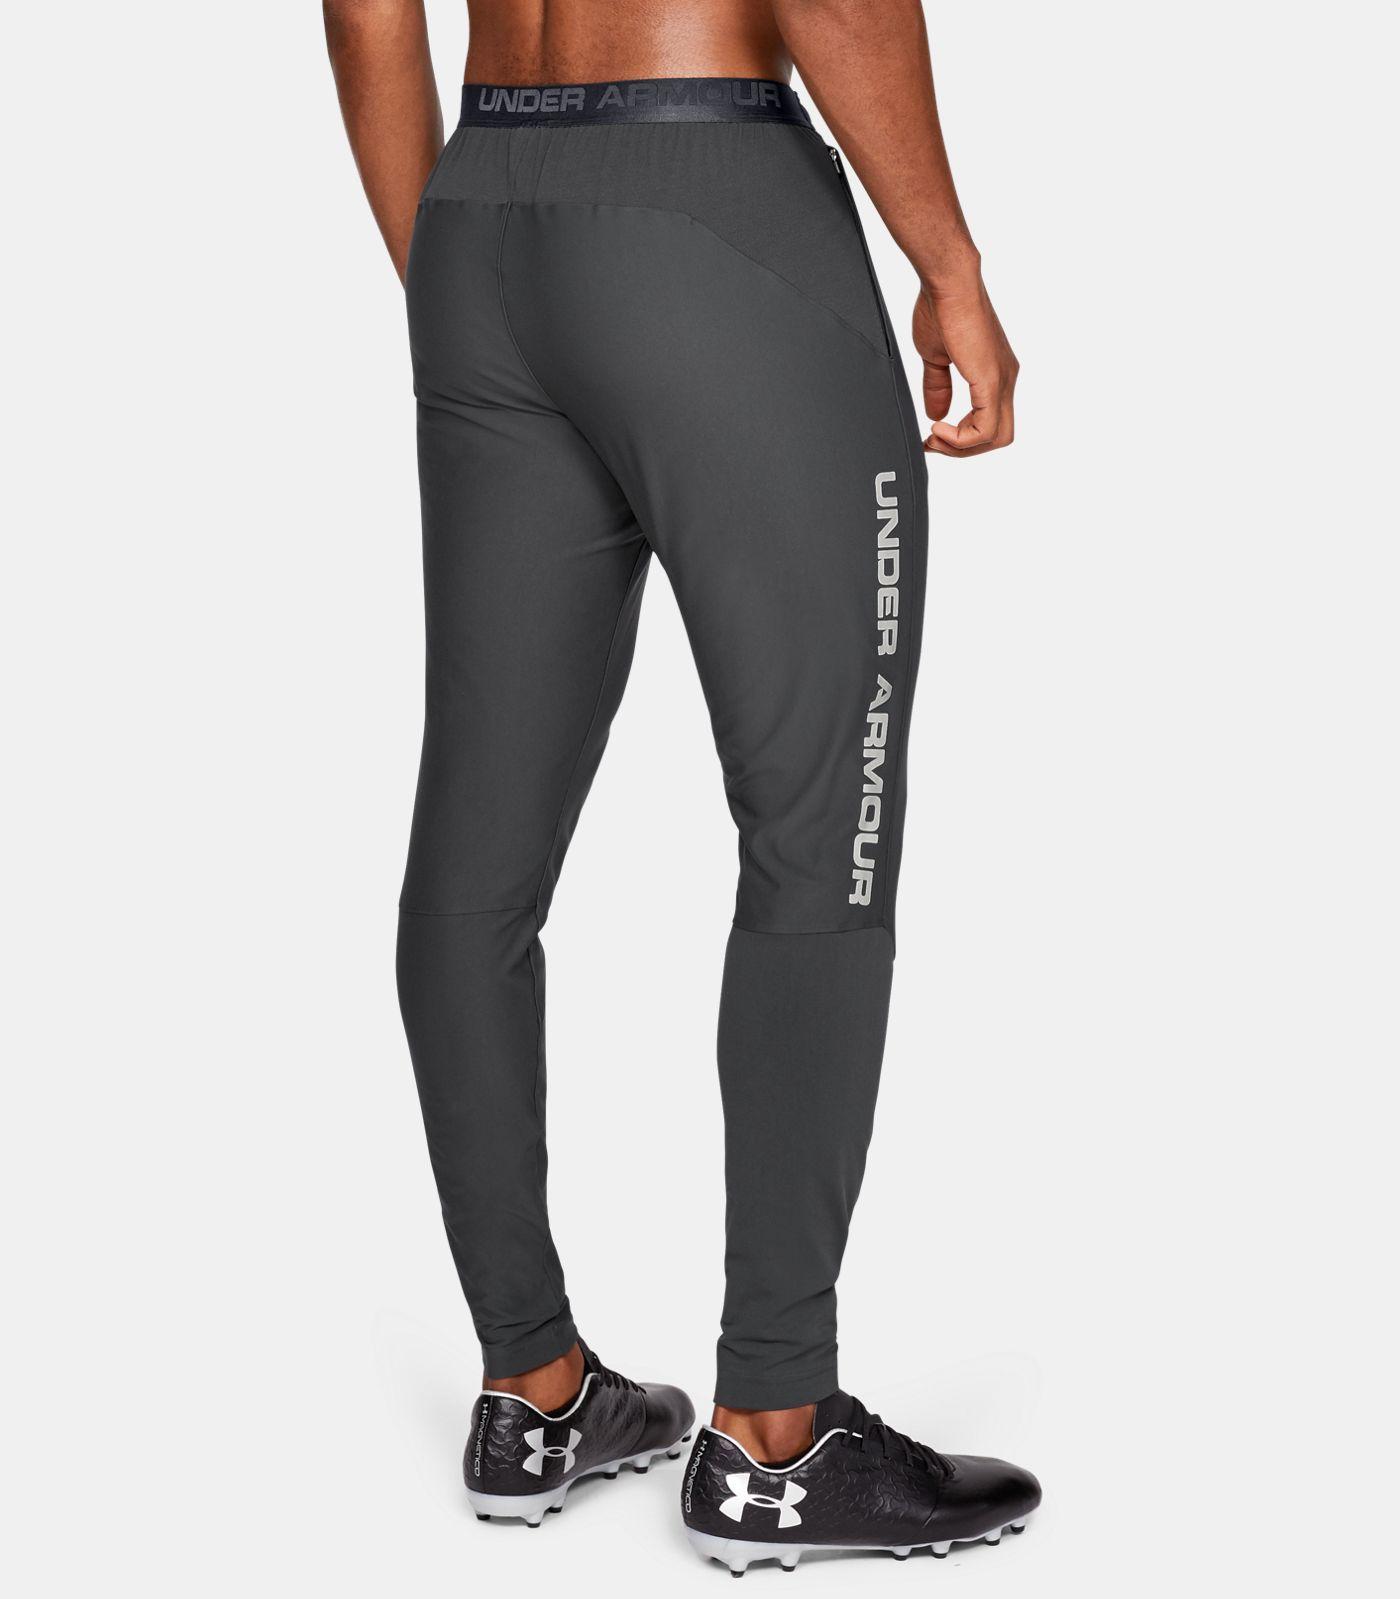 Under Armour UA Men/'s Accelerate Training Football Pants New Black Large